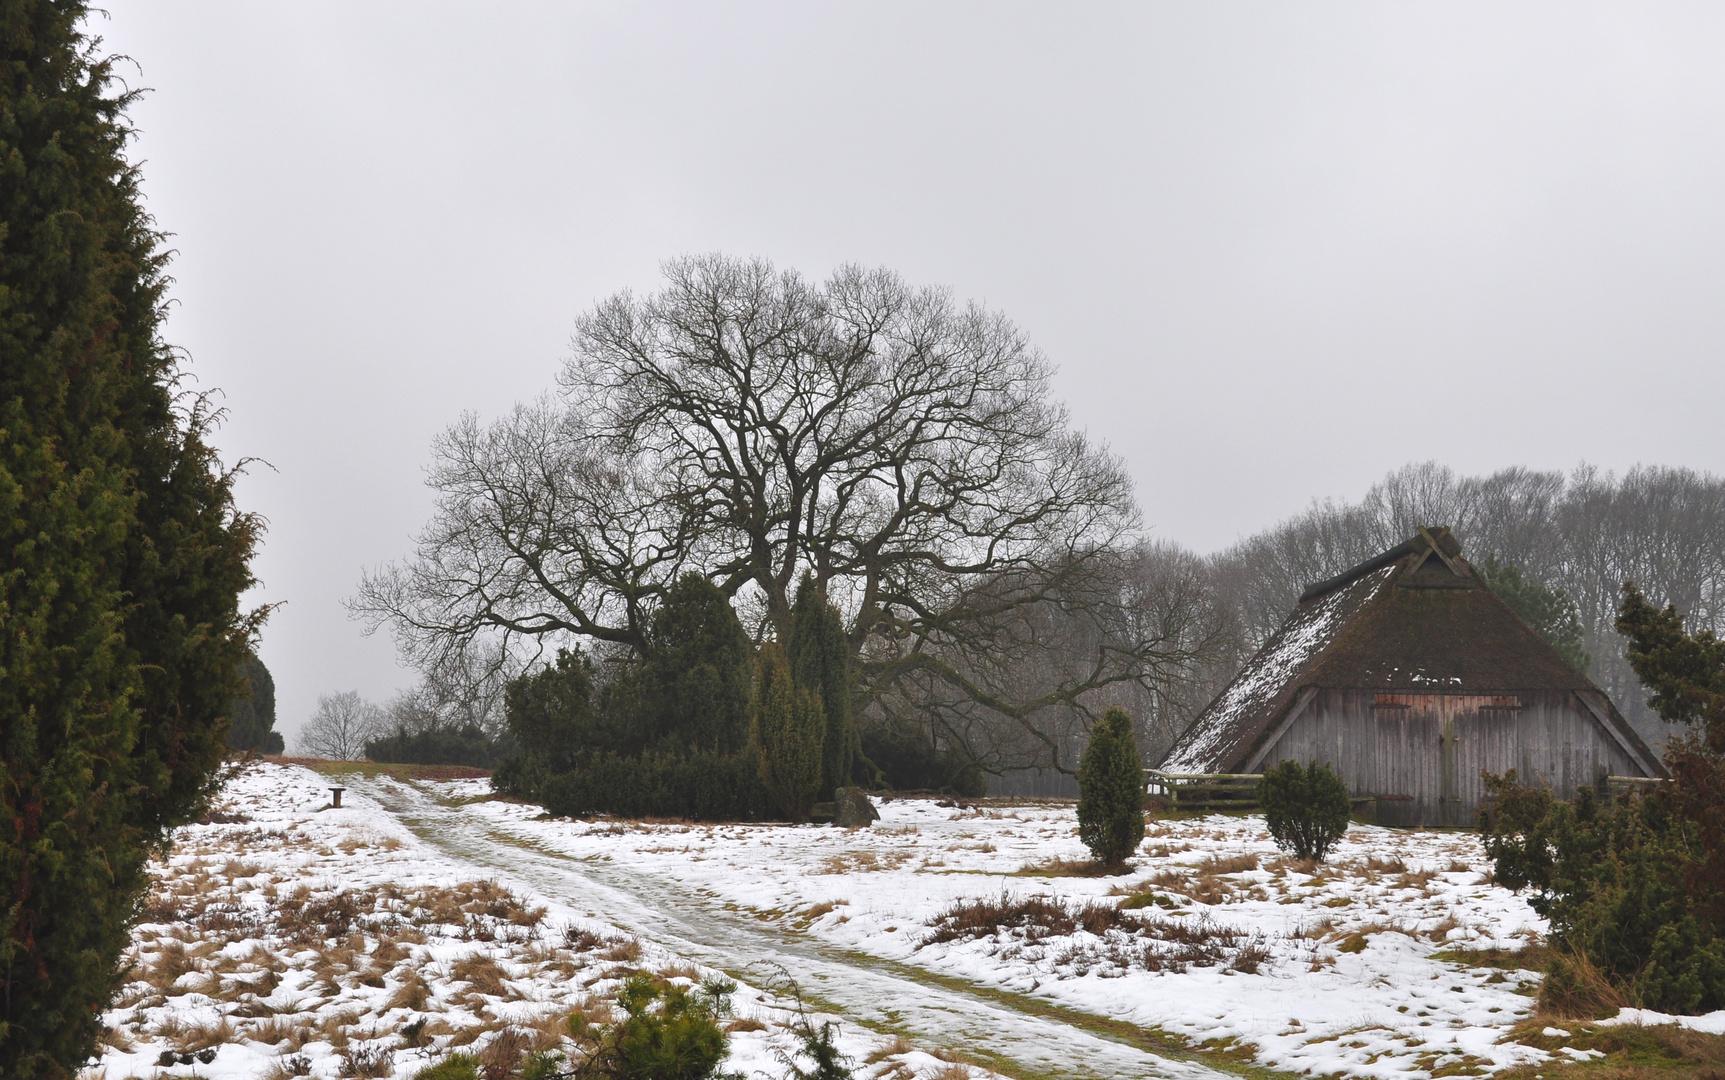 Schafstall in der Lüneburger Heide